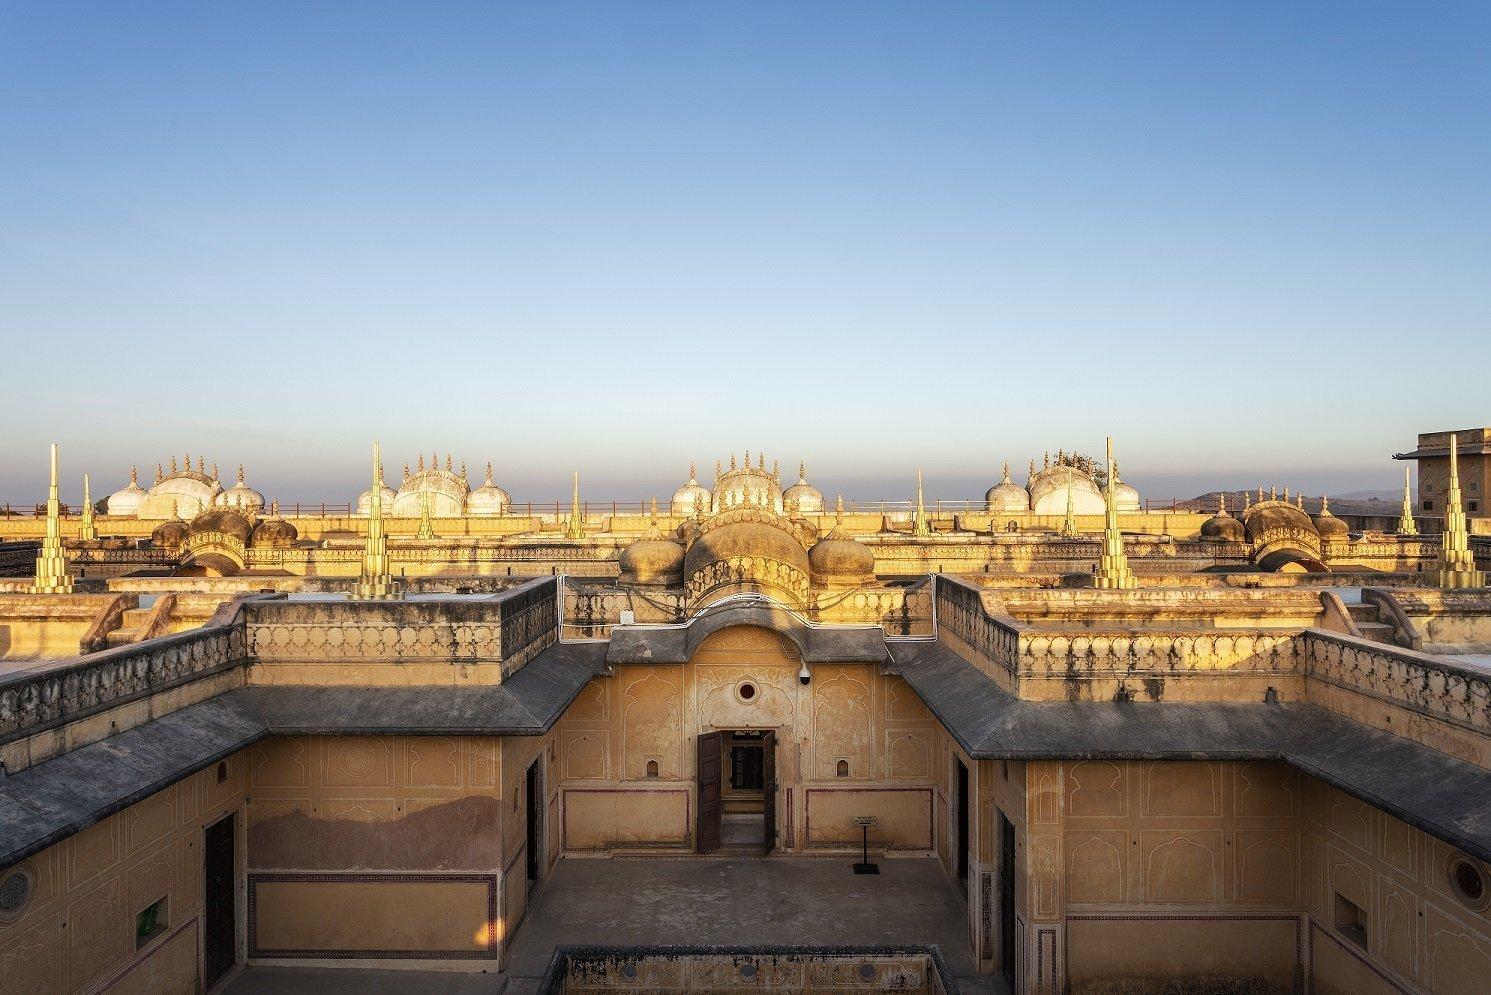 Madhavendra Palace